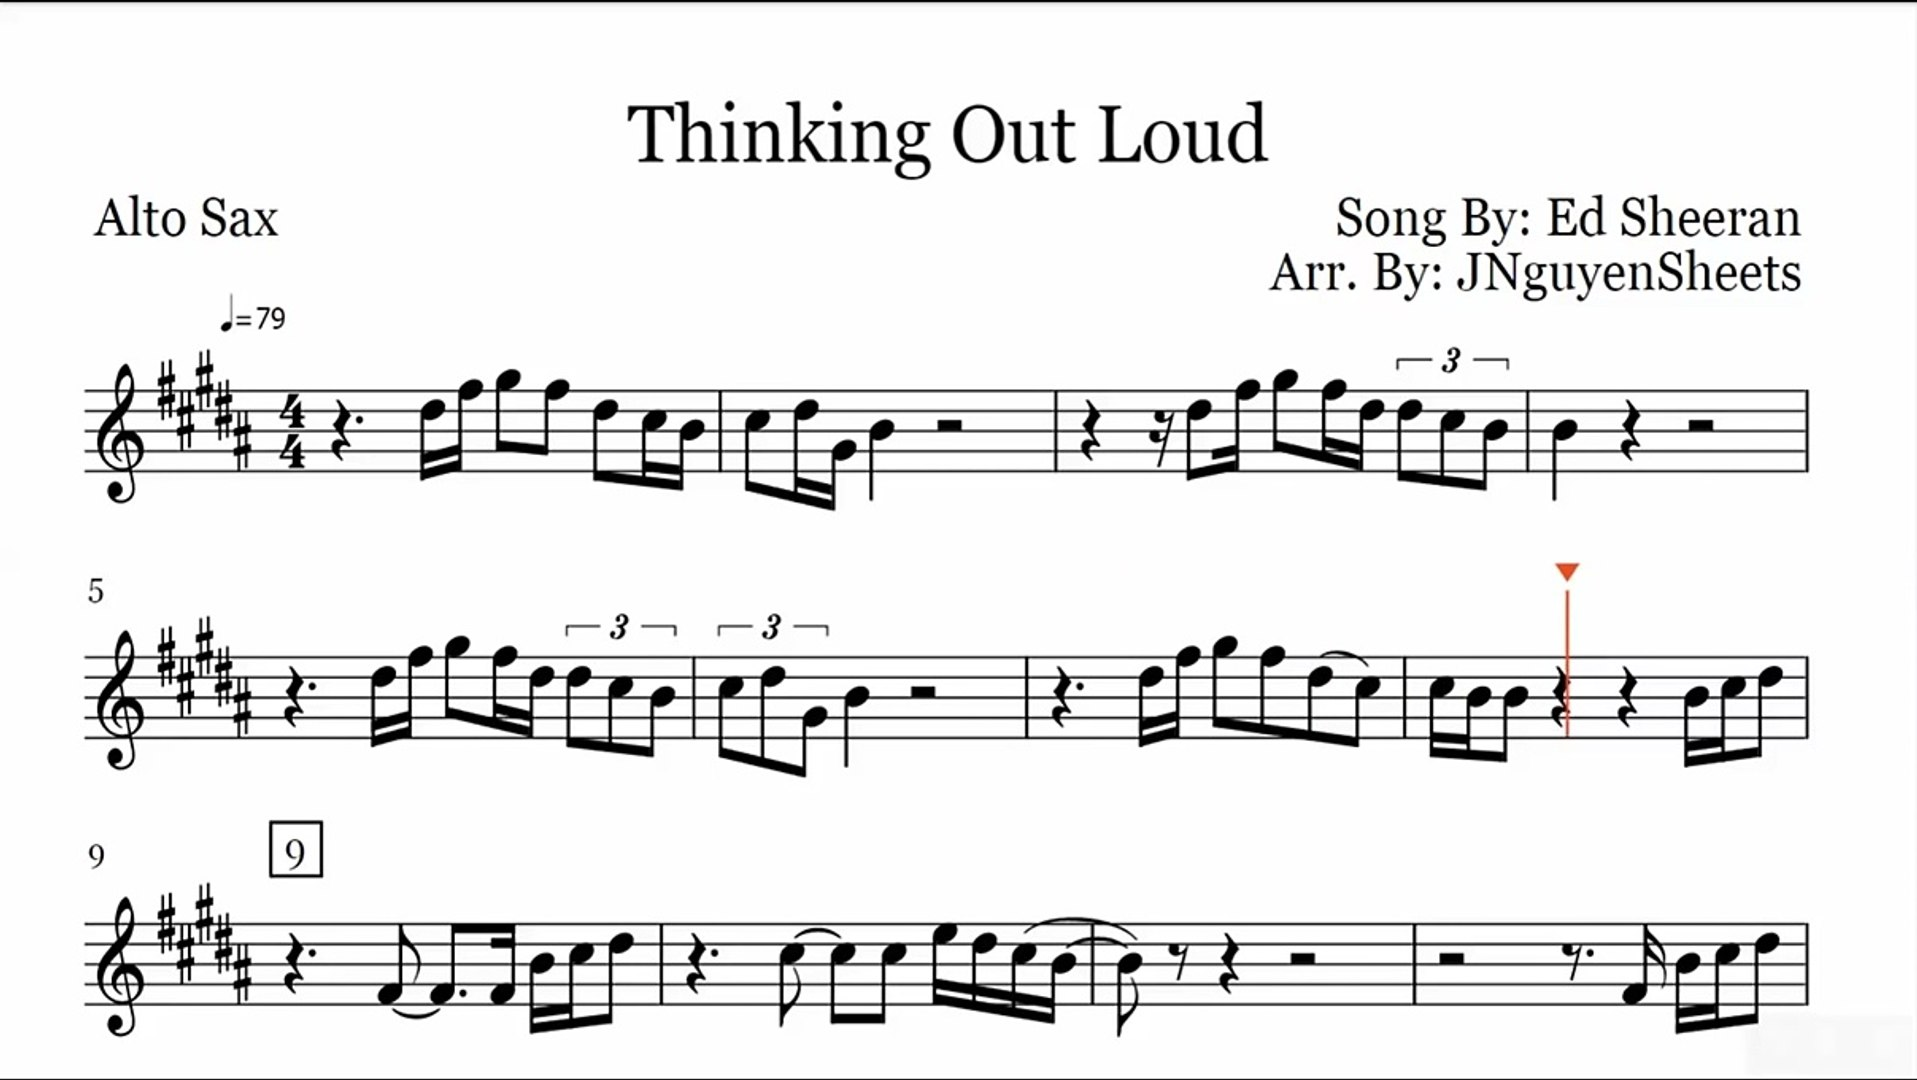 Thinking Out Loud Ed Sheeran Saxophone Sheet Music